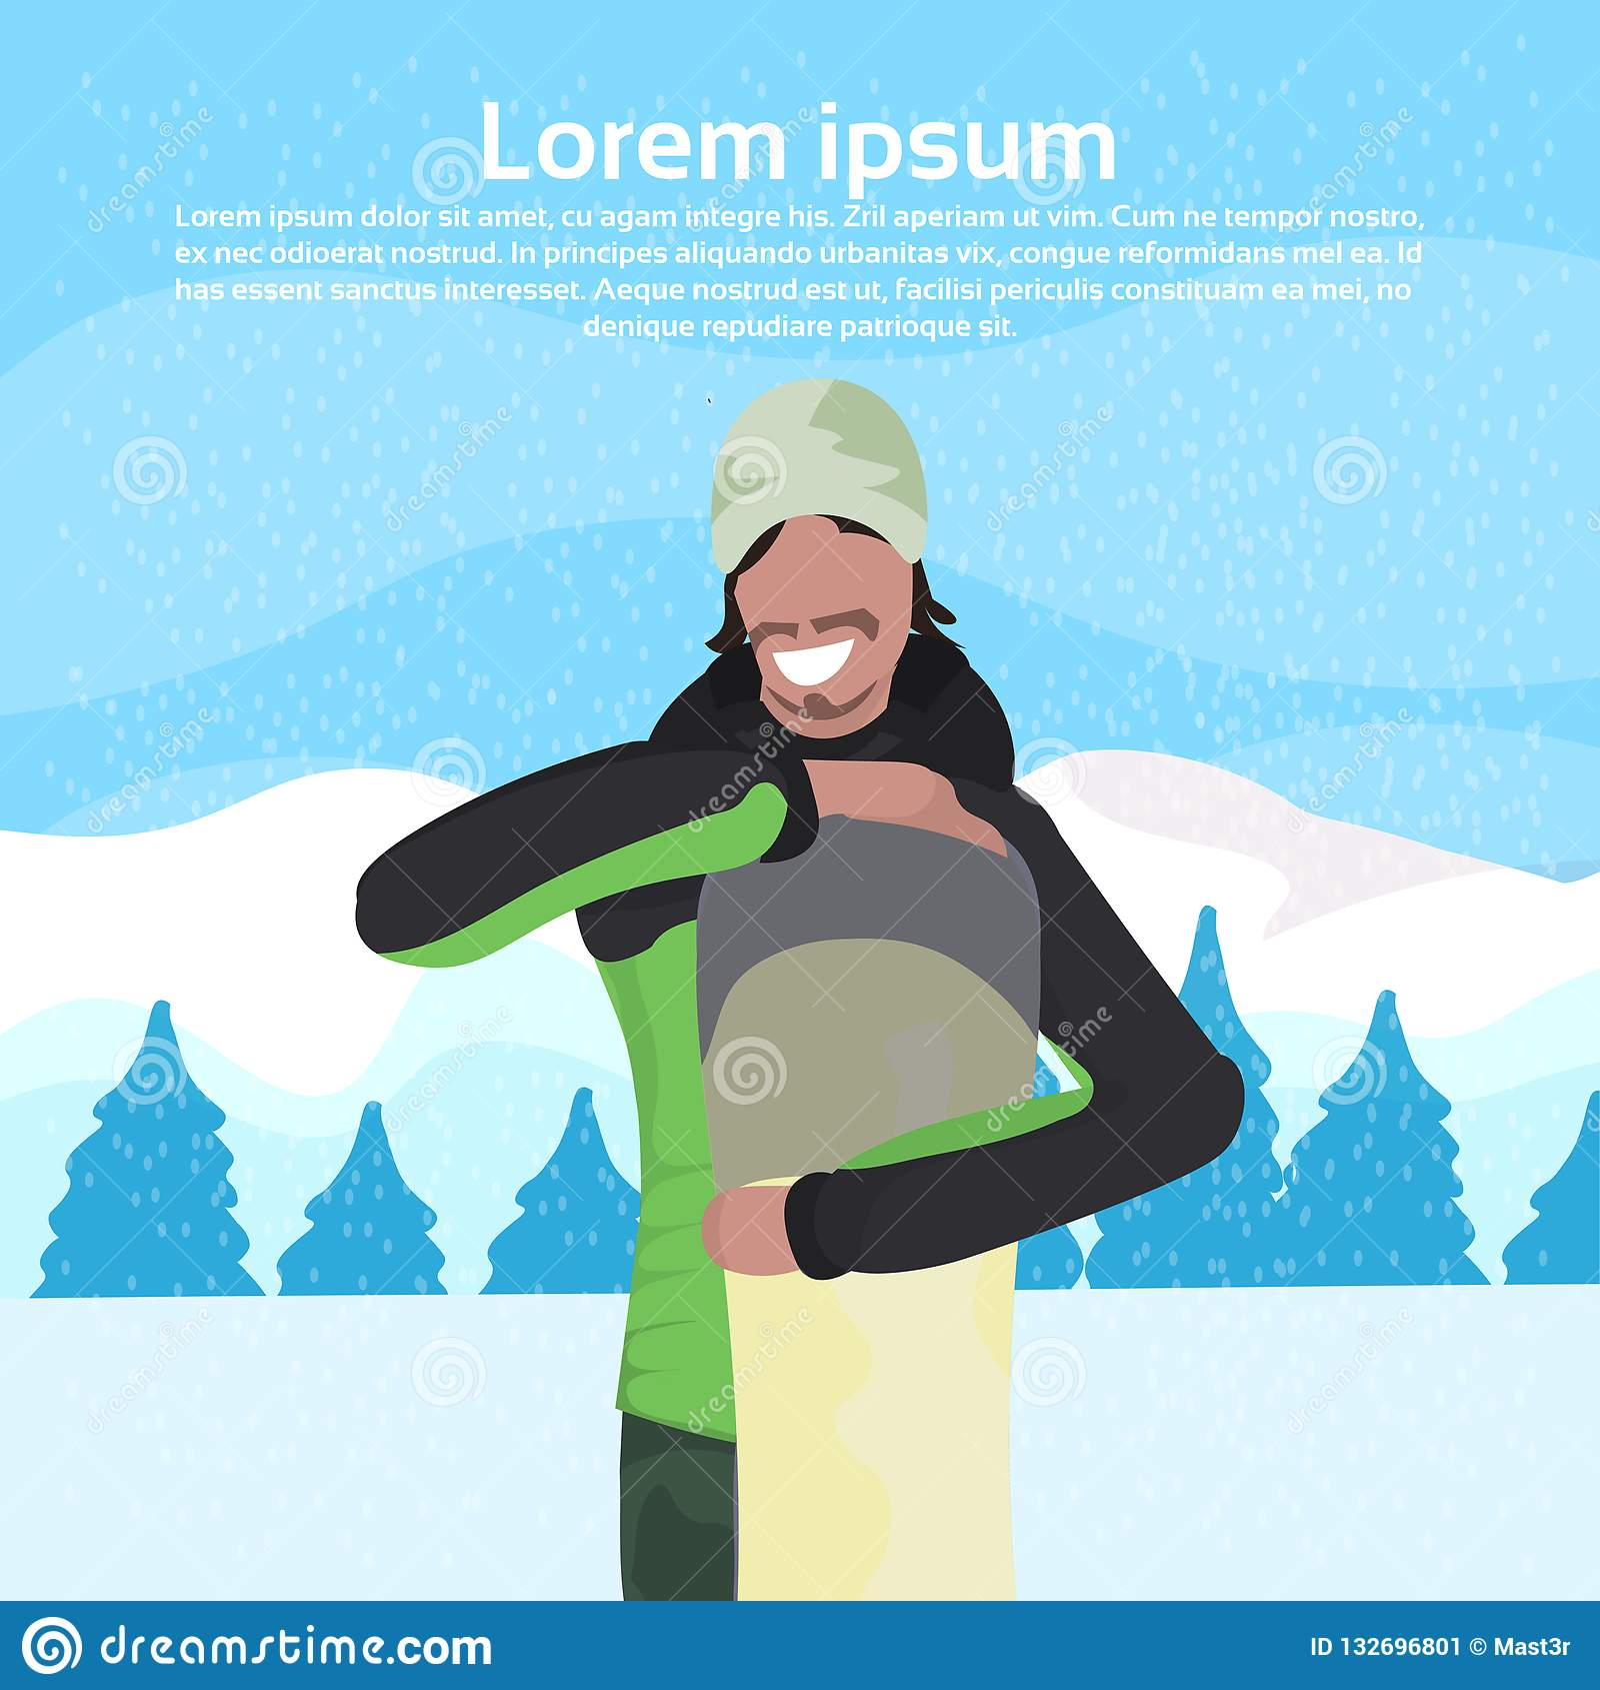 26a54d0b442 Snowboard Portrait Stock Illustrations – 143 Snowboard Portrait Stock  Illustrations